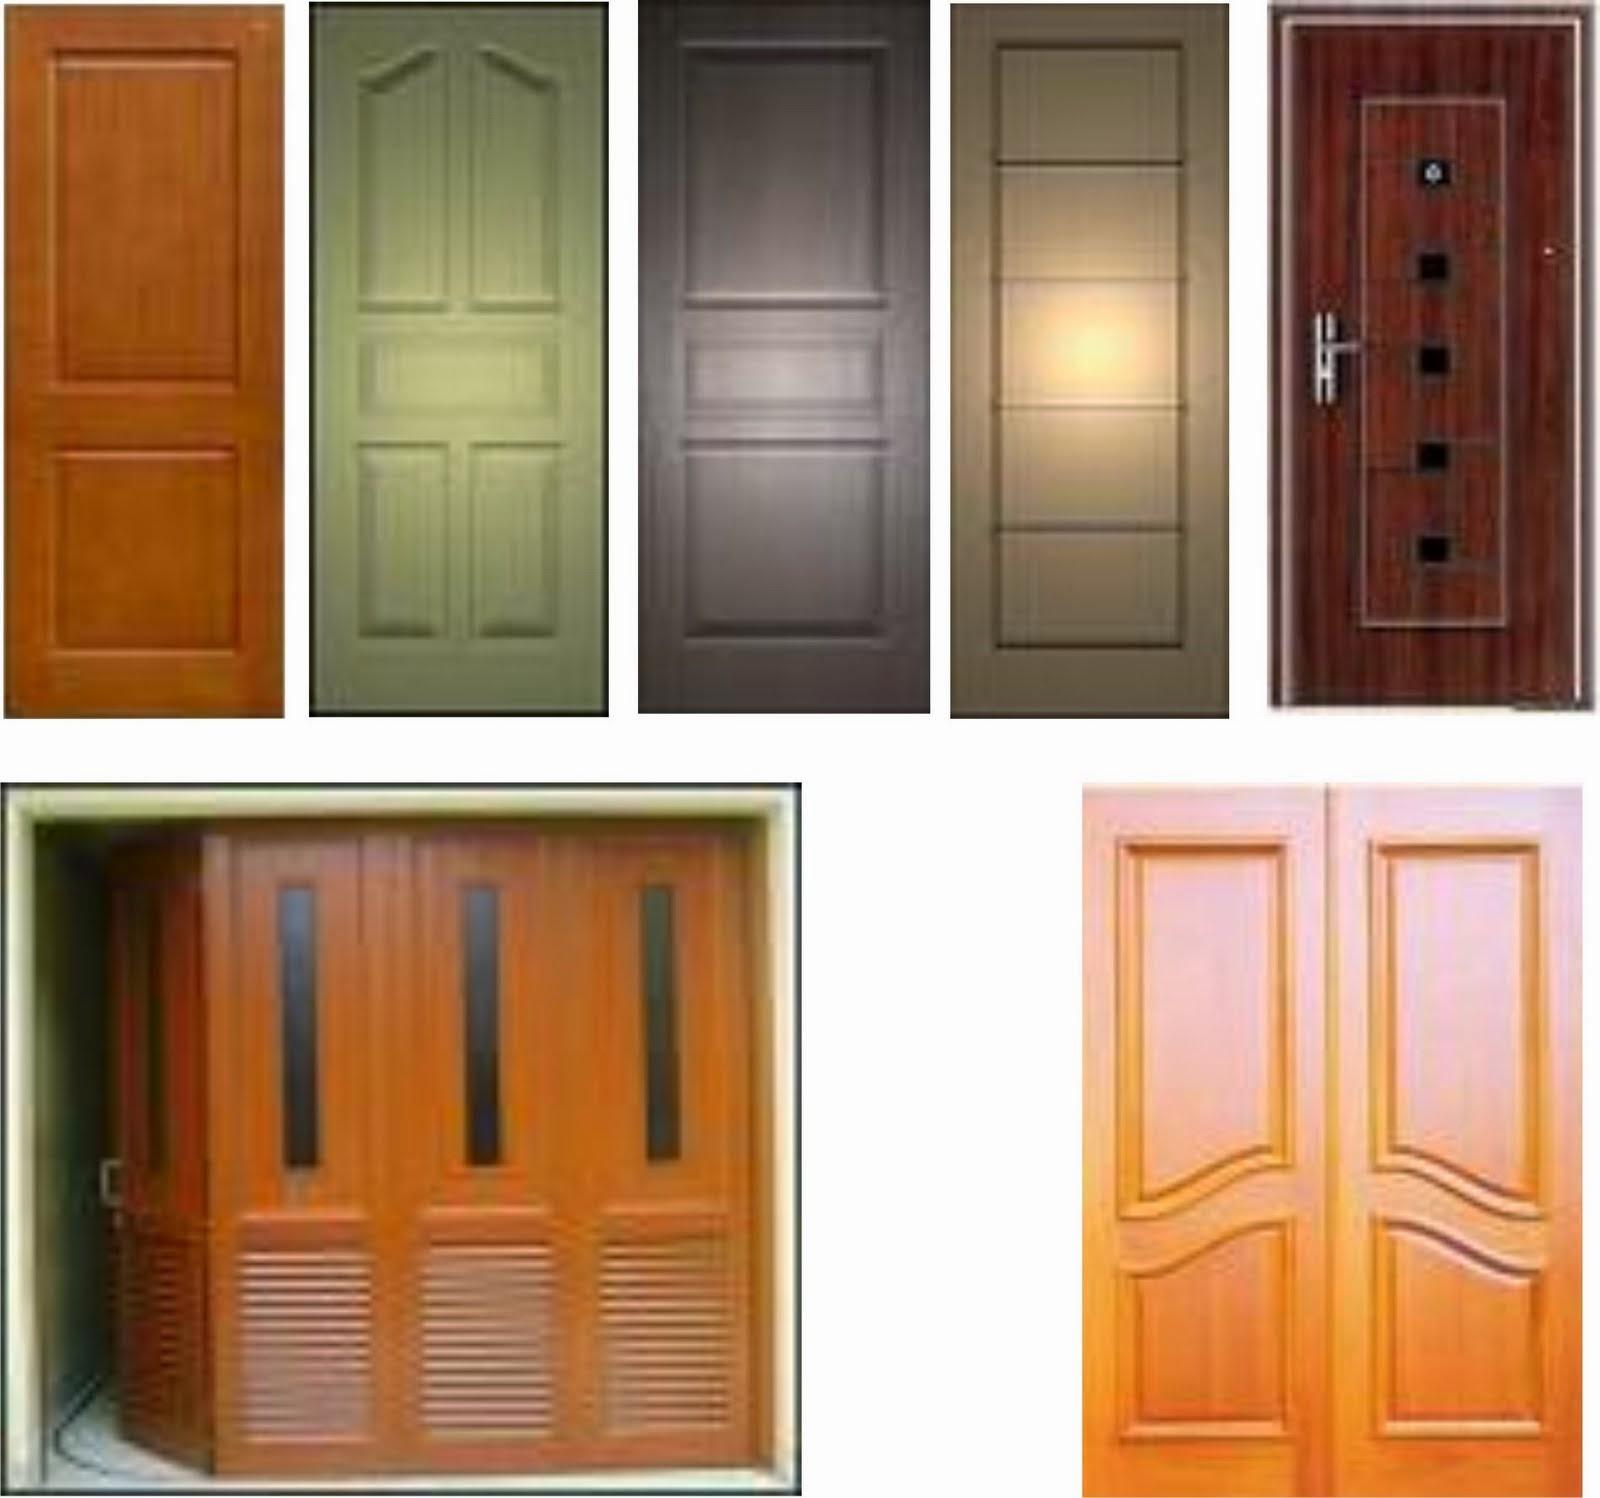 Model Pintu Rumah Minimalis Modern Terbaru Yang Cantik ...